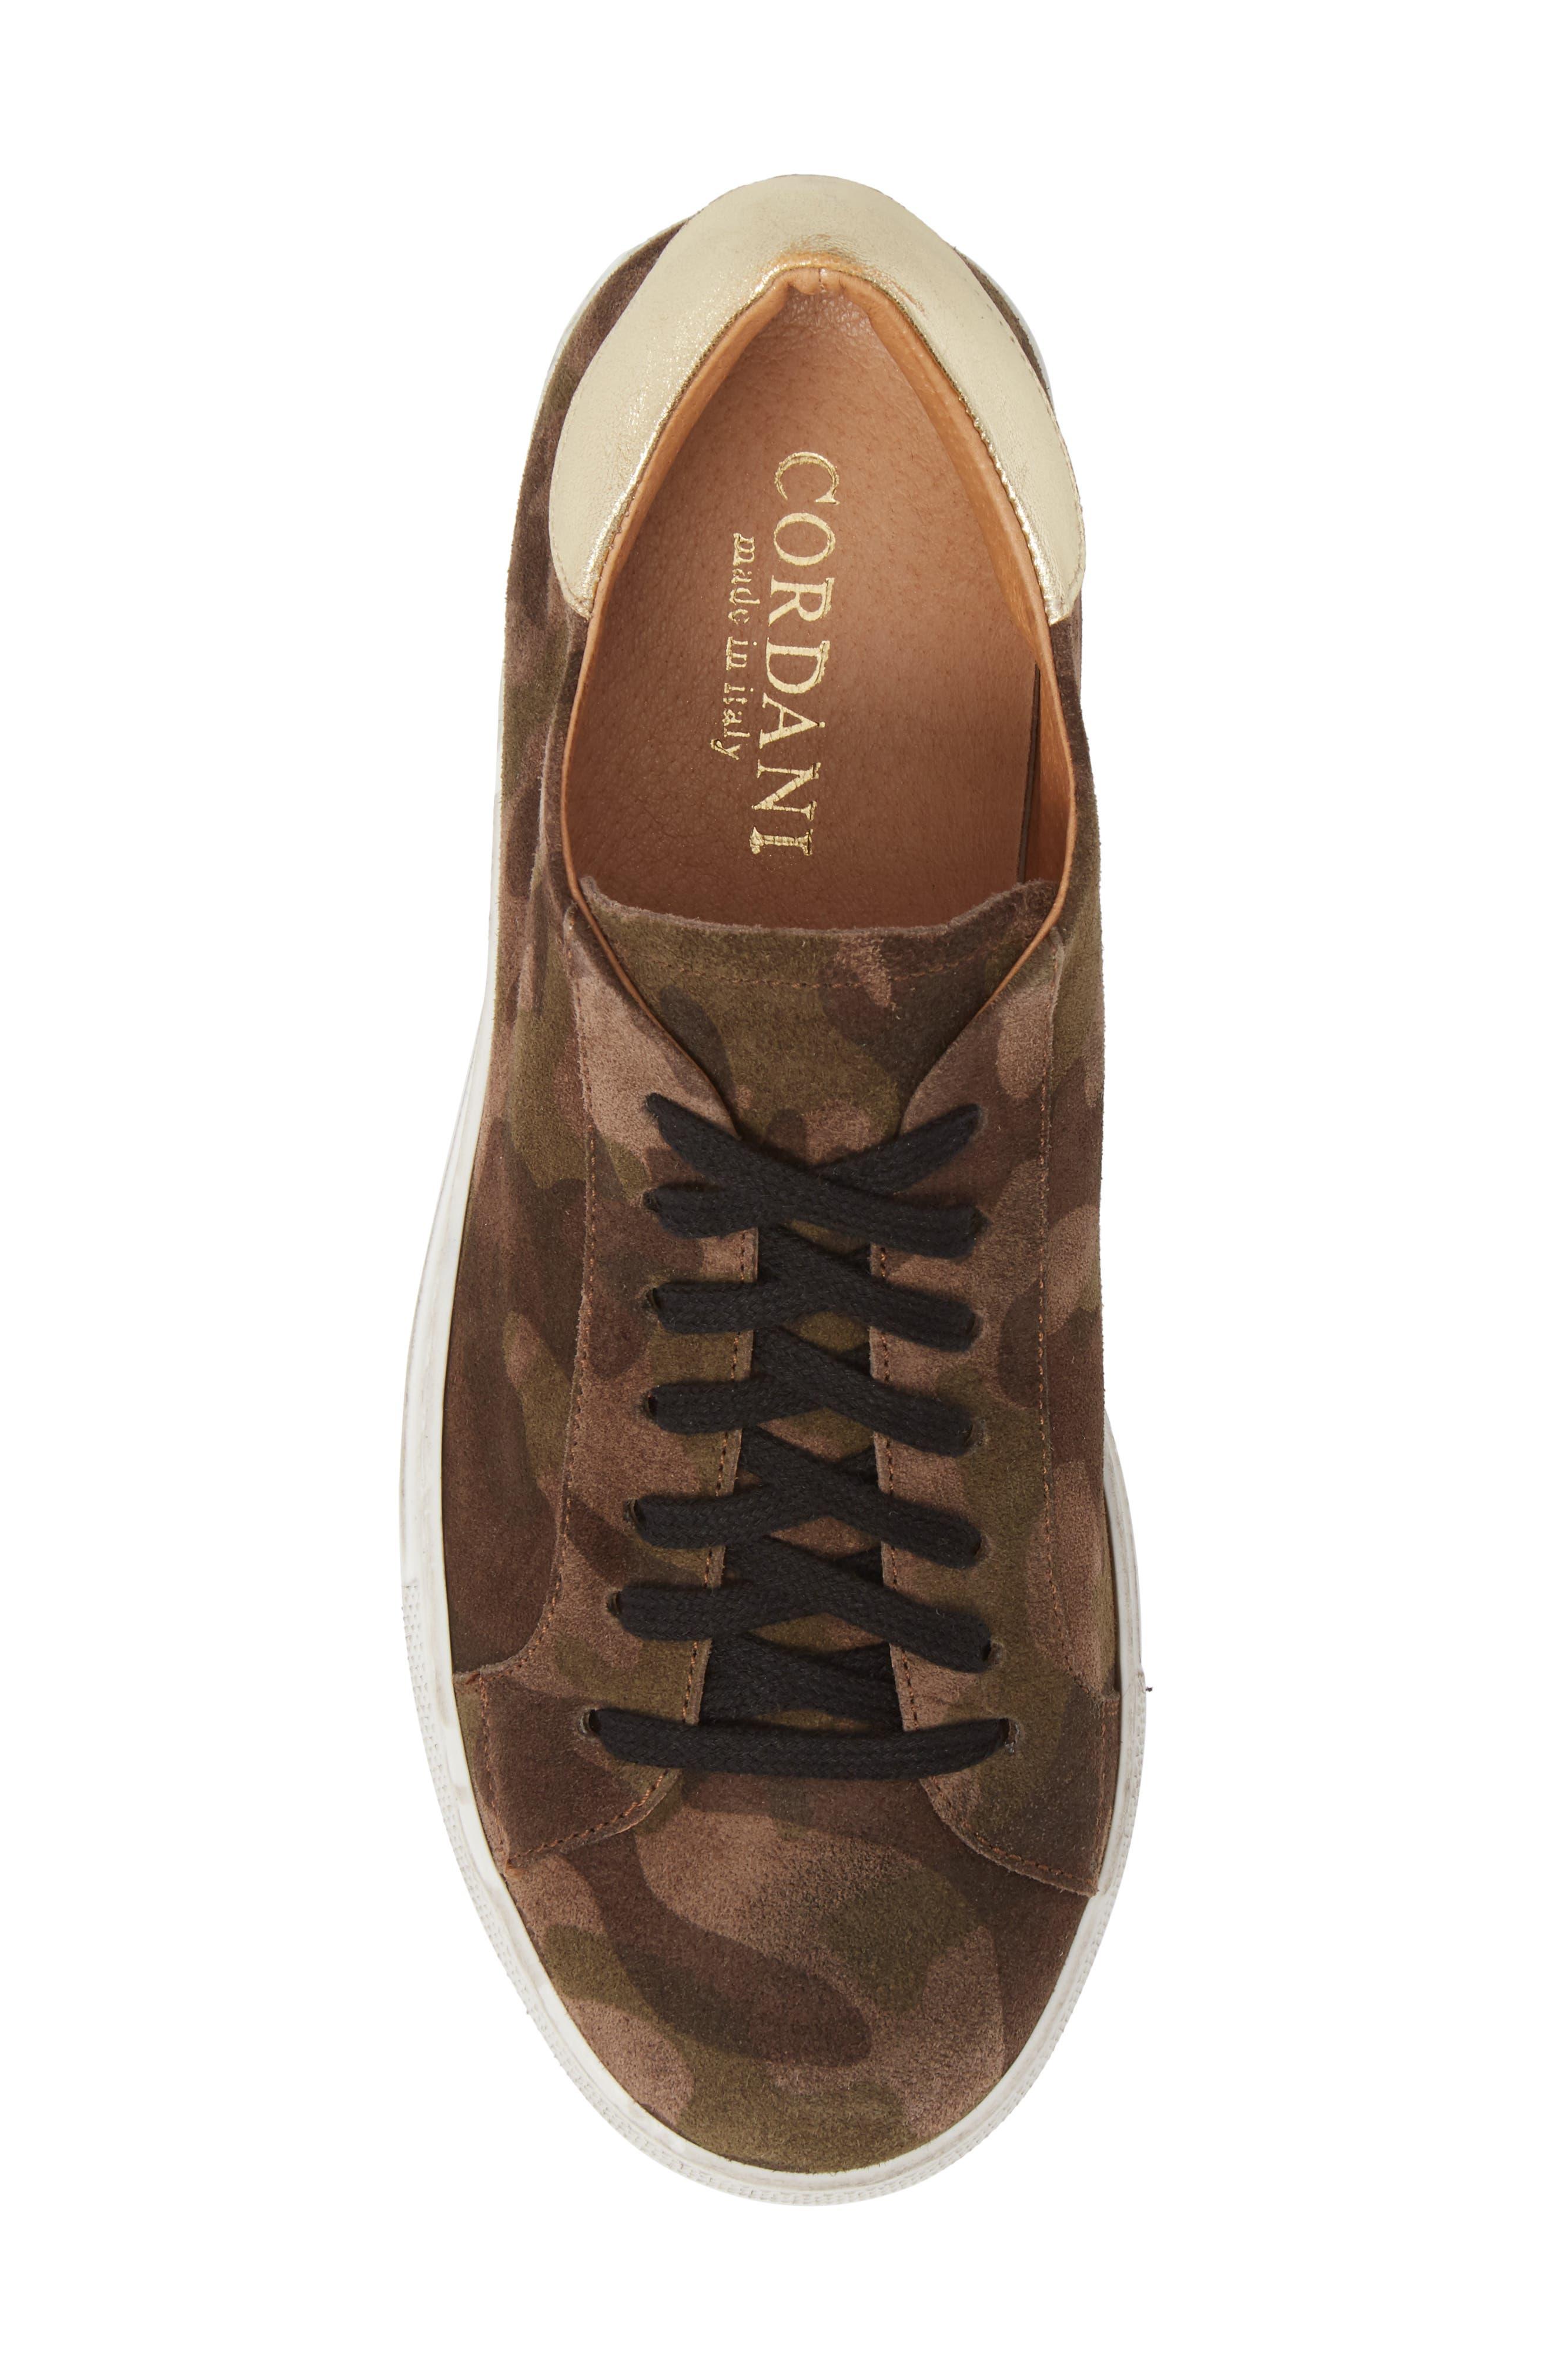 Orissa Sneaker,                             Alternate thumbnail 5, color,                             MILITARY PRINT SUEDE